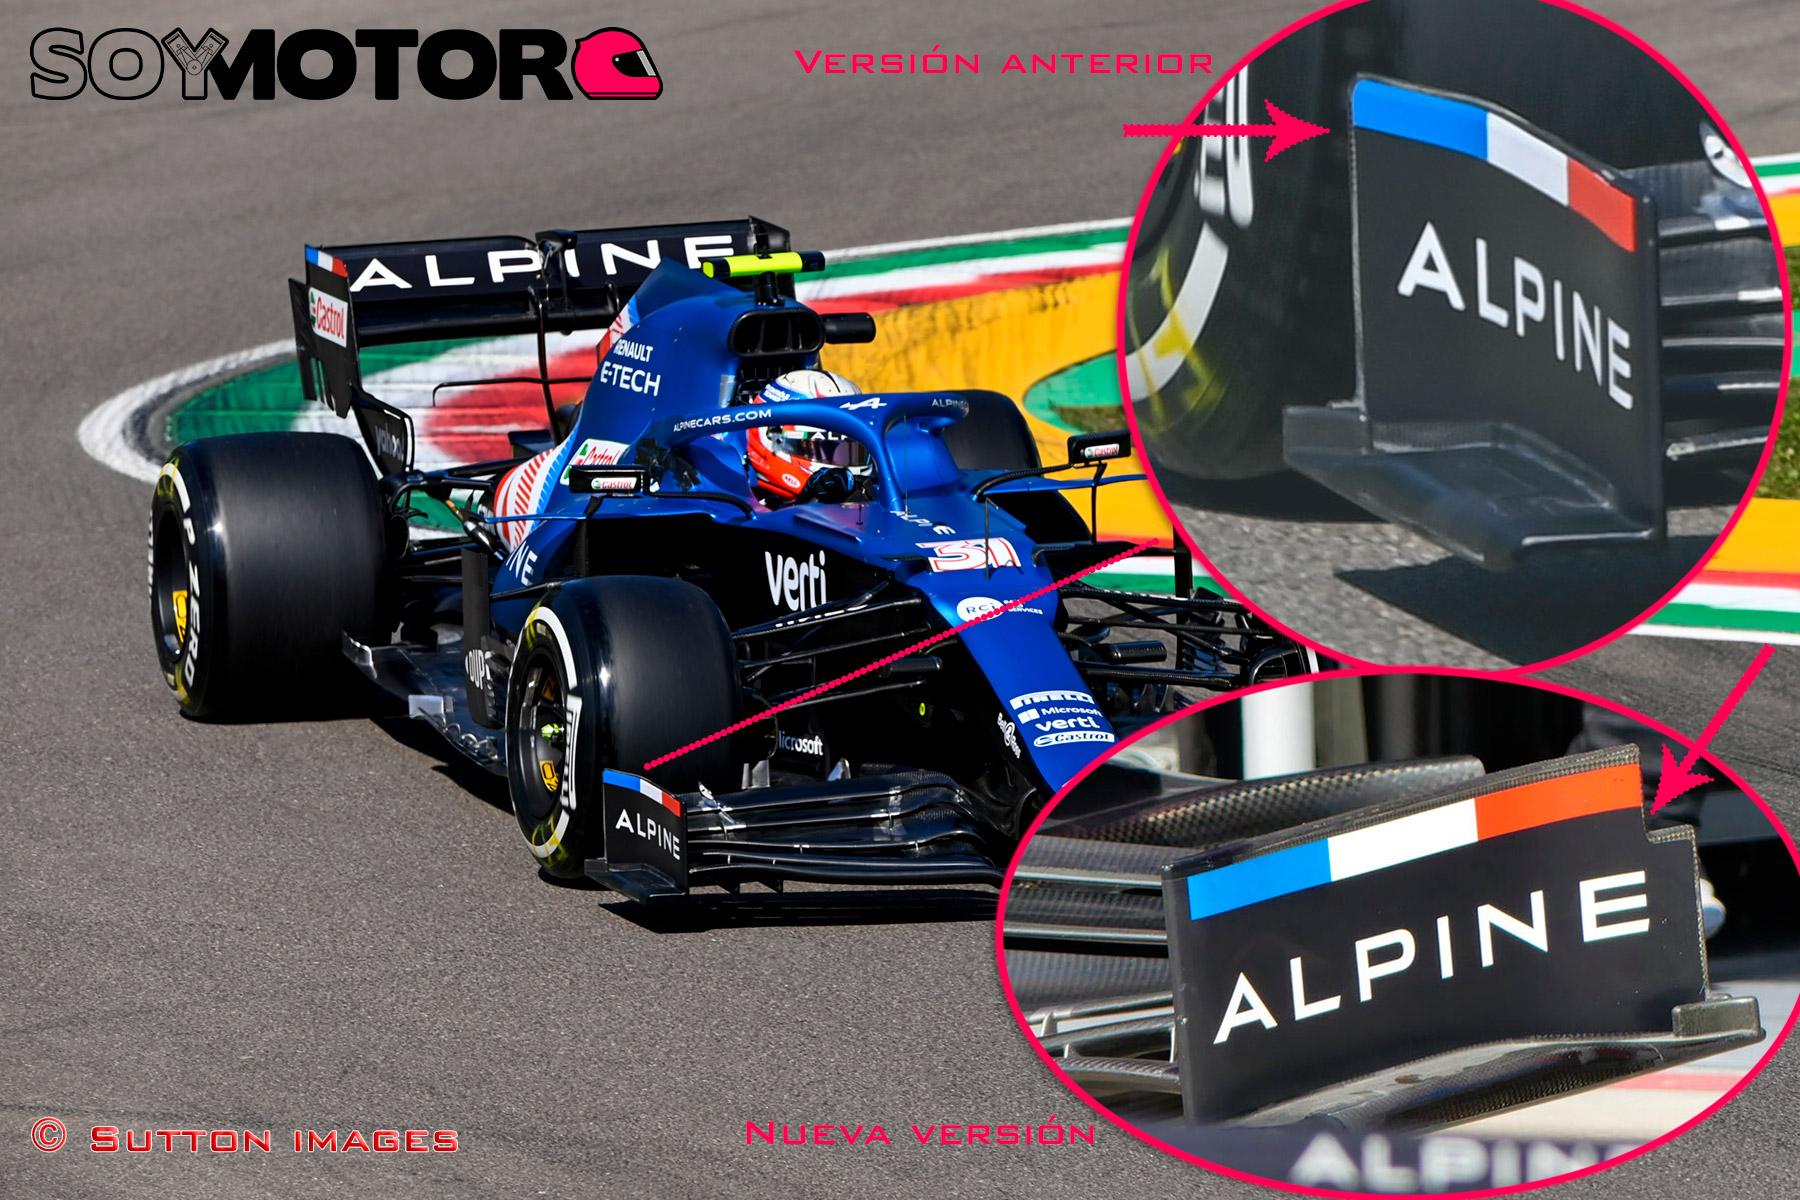 alpine-ala-delantera-endplate-soymotor.jpg